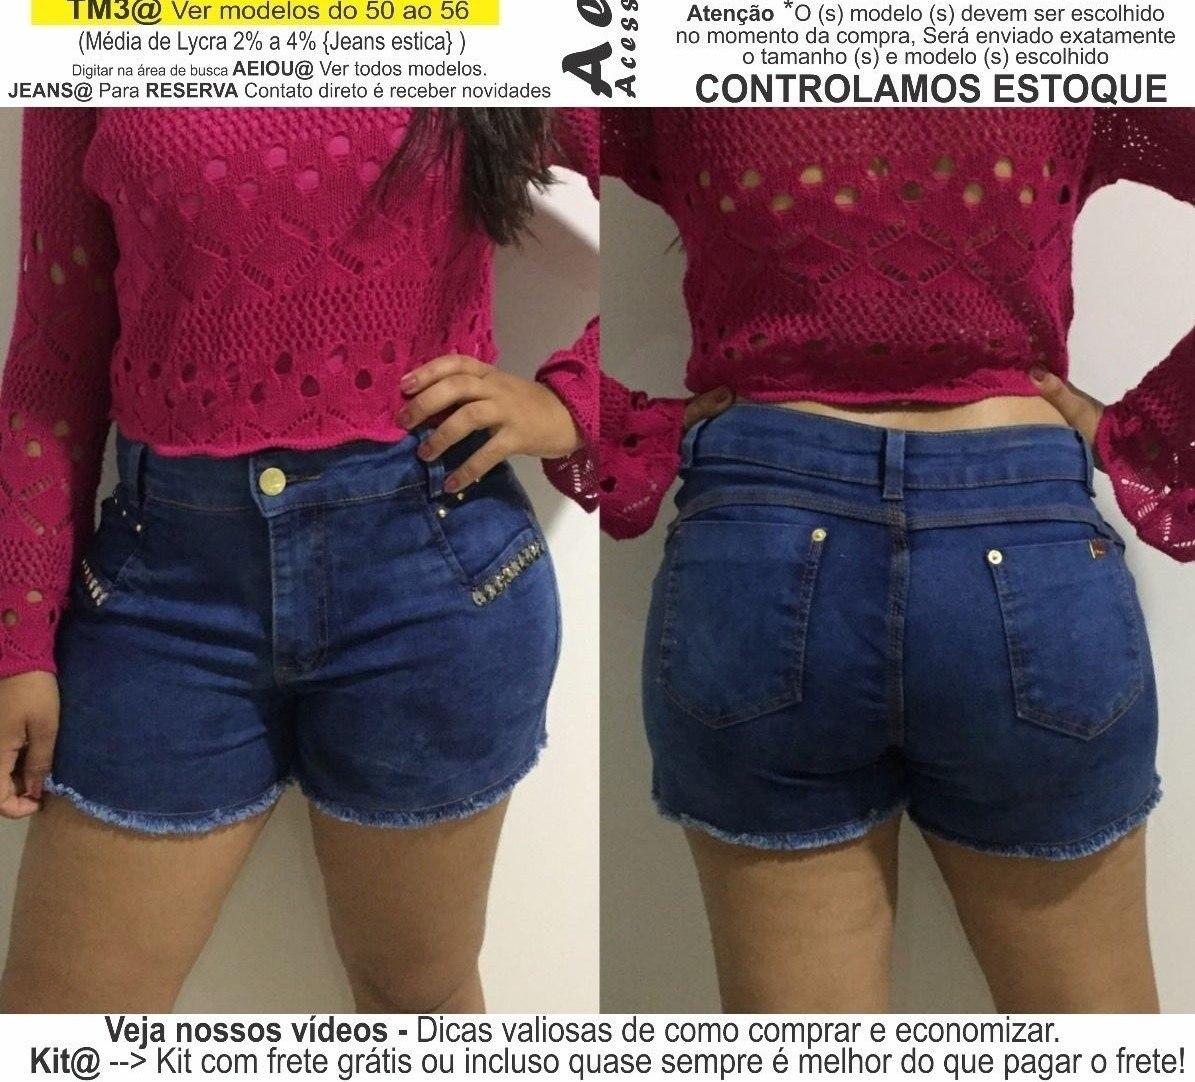 ac1cd75062 roupas femininas short jeans lycra rasgo pedras unli  shpm16. Carregando  zoom.